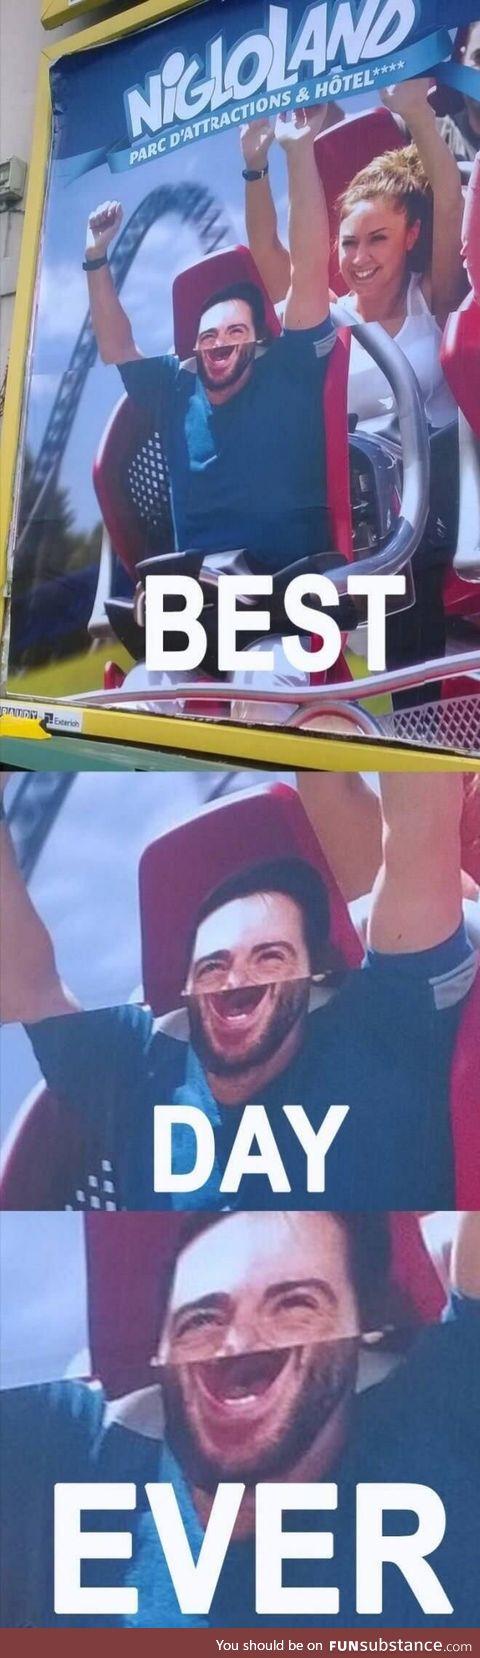 He just screams joy